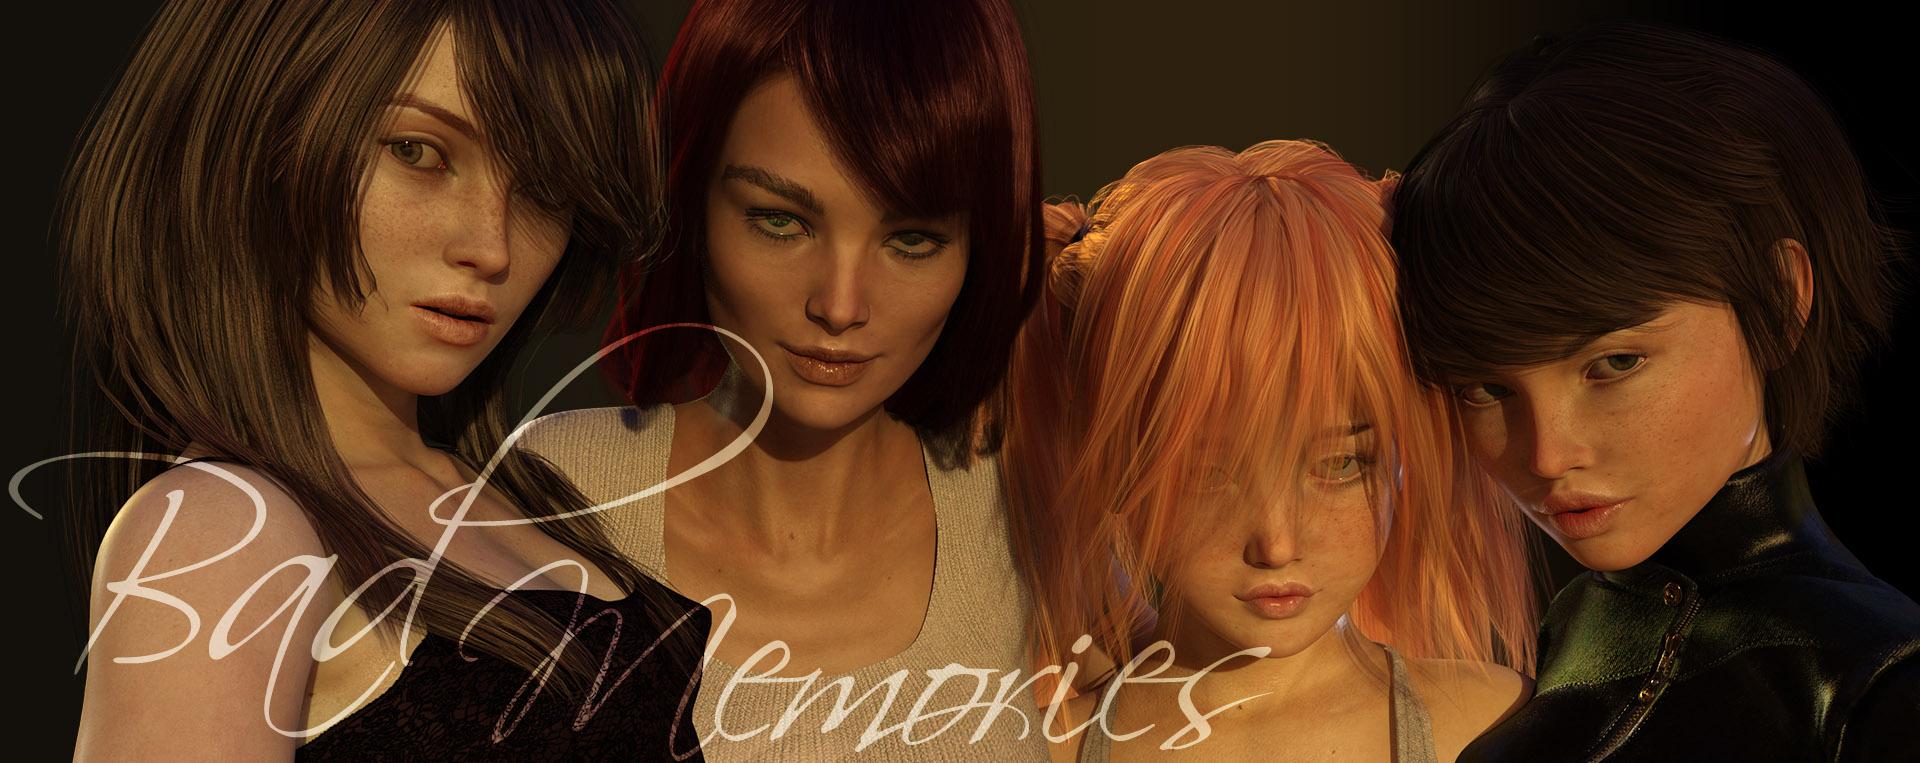 Bad Memories [recreation]